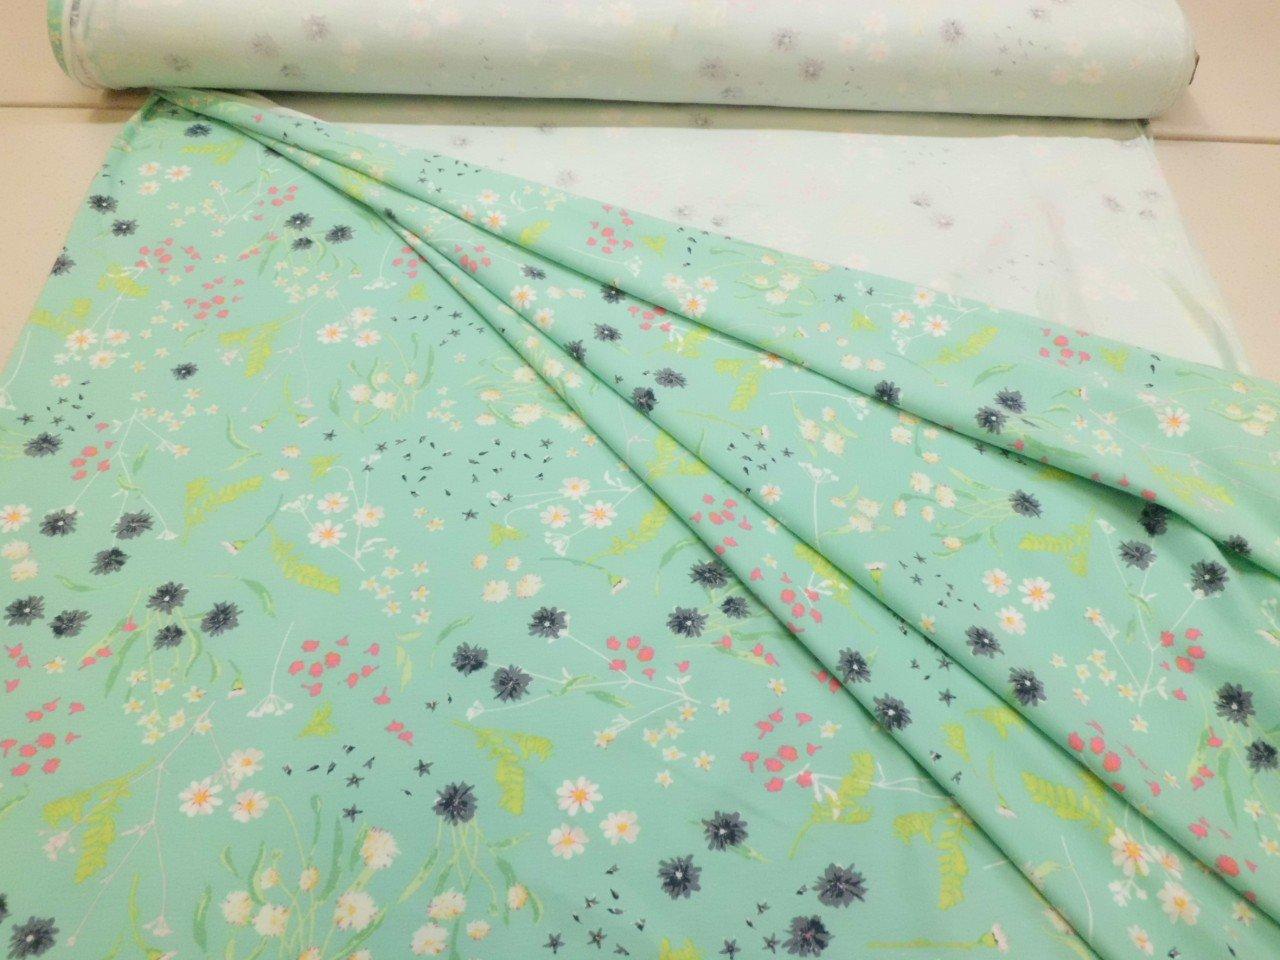 Art Gallery Cotton & Spandex Knit Floral Print in Aqua